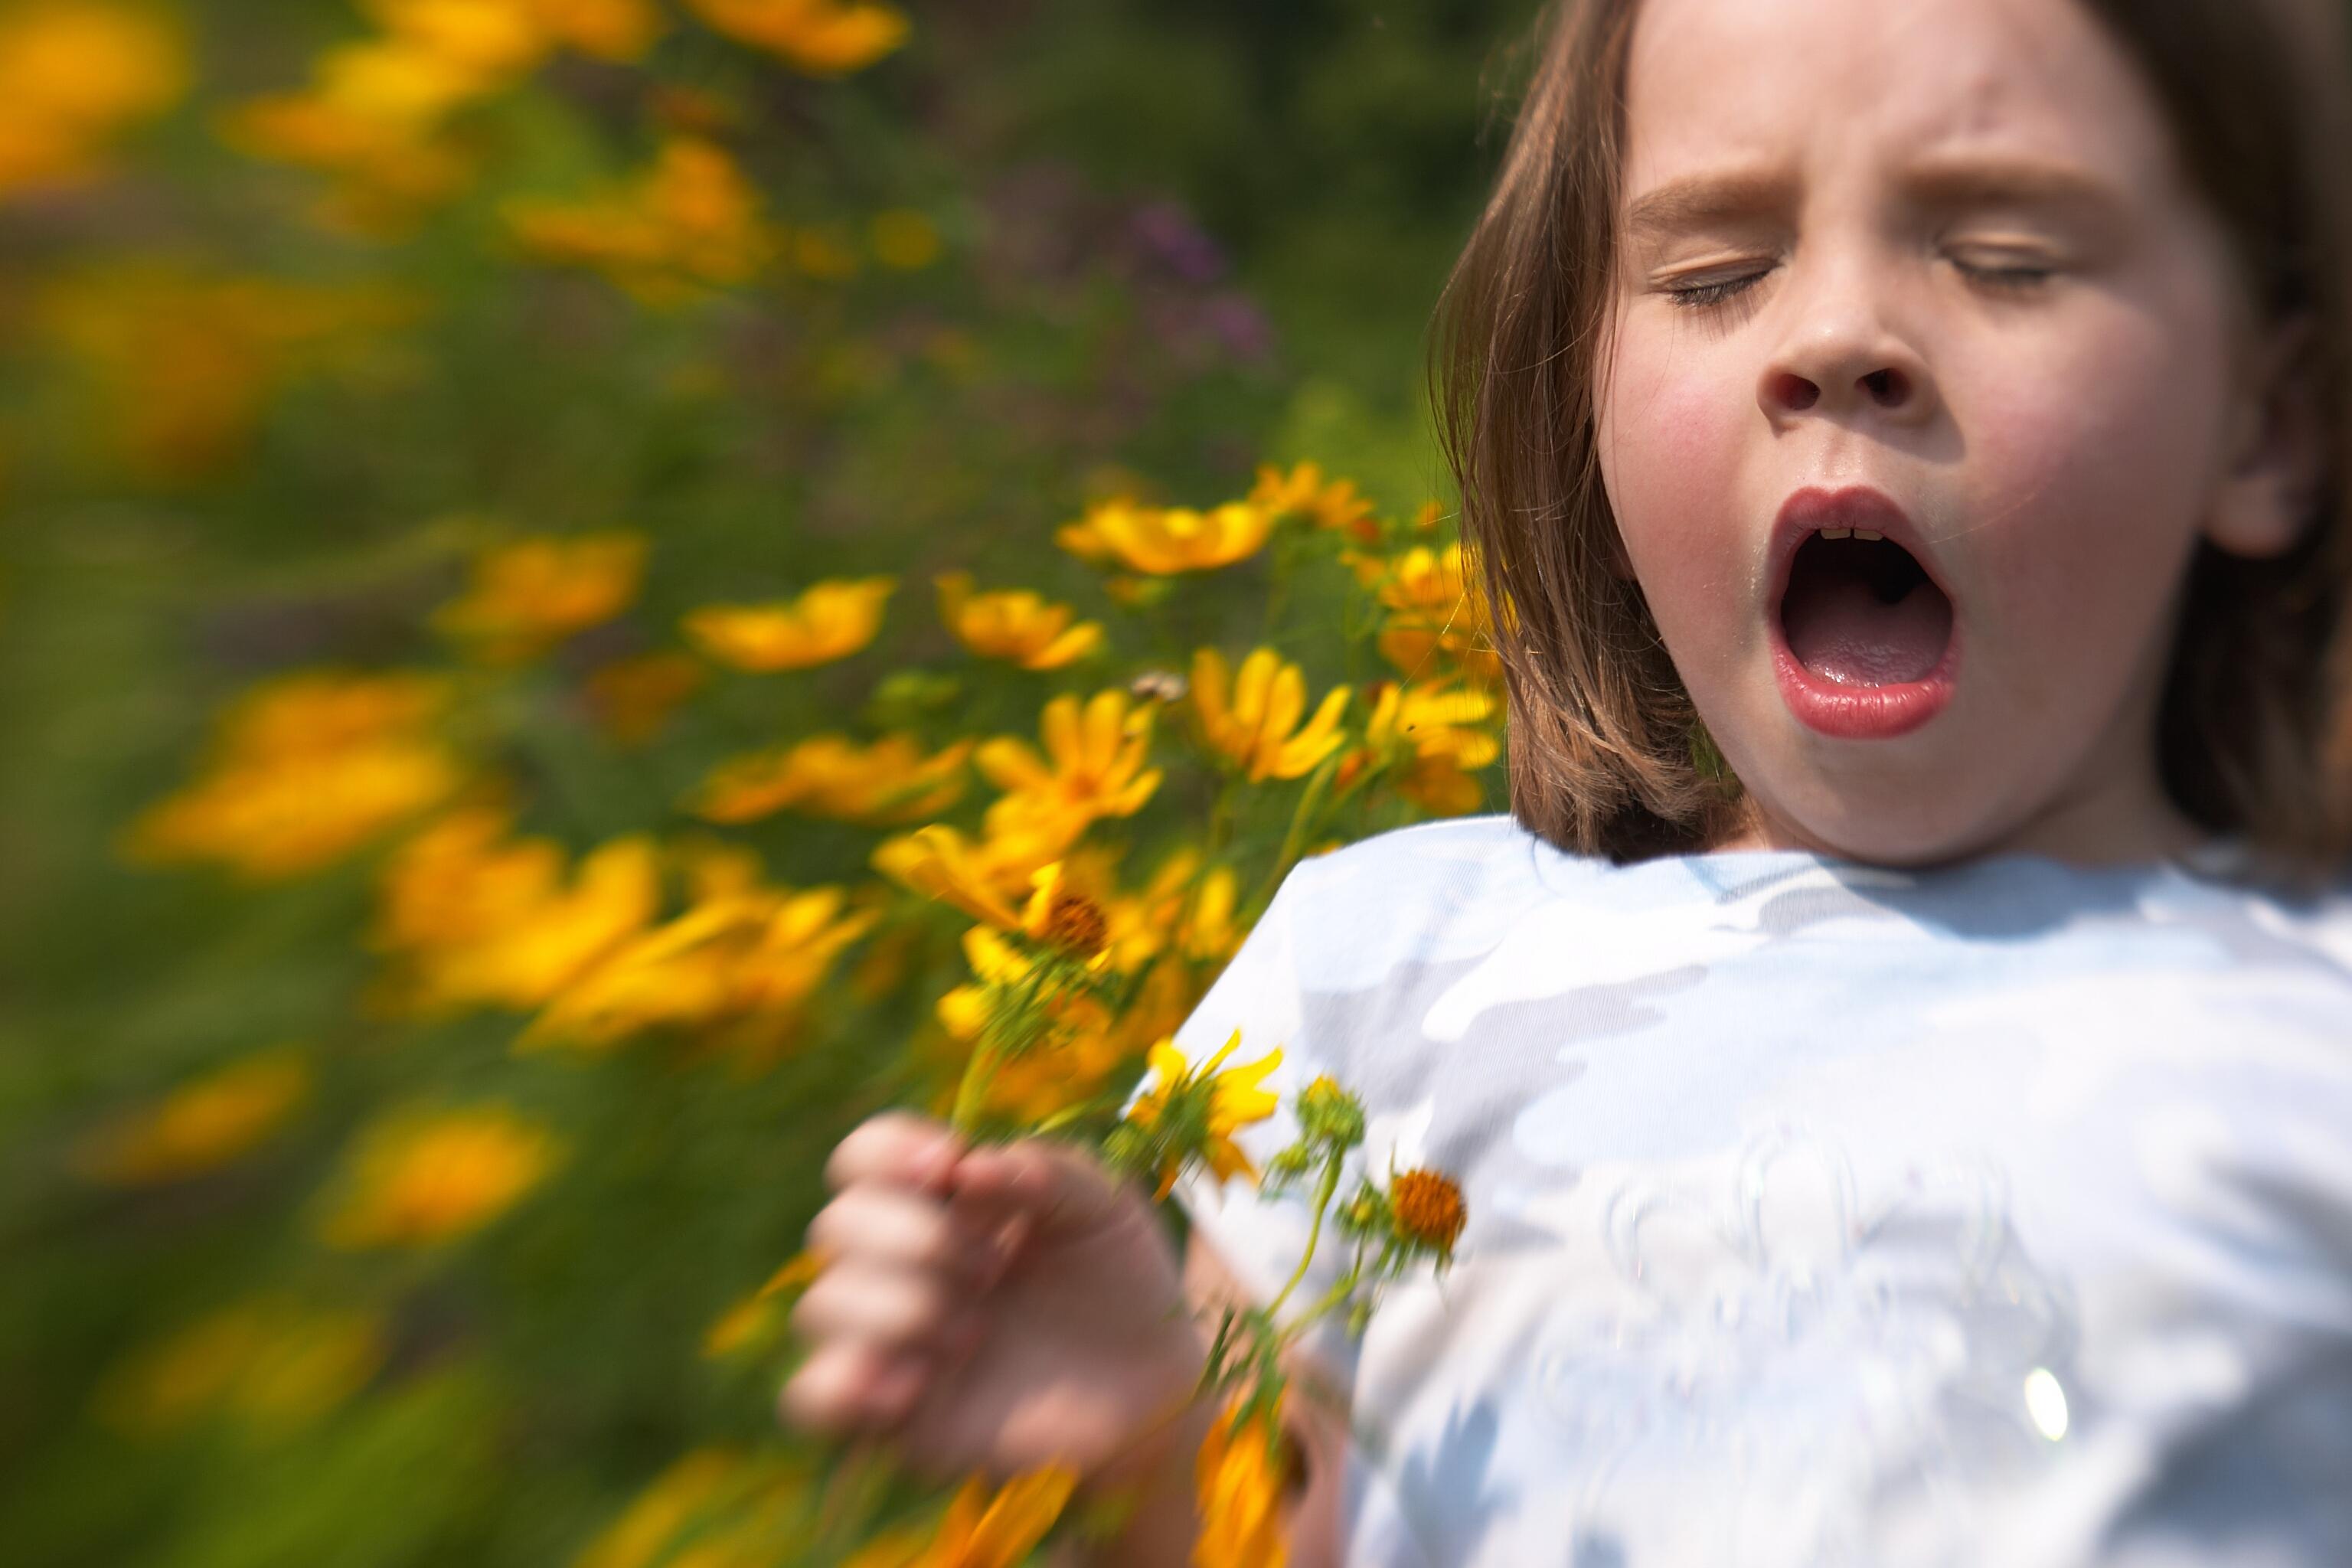 Kid Sneezing